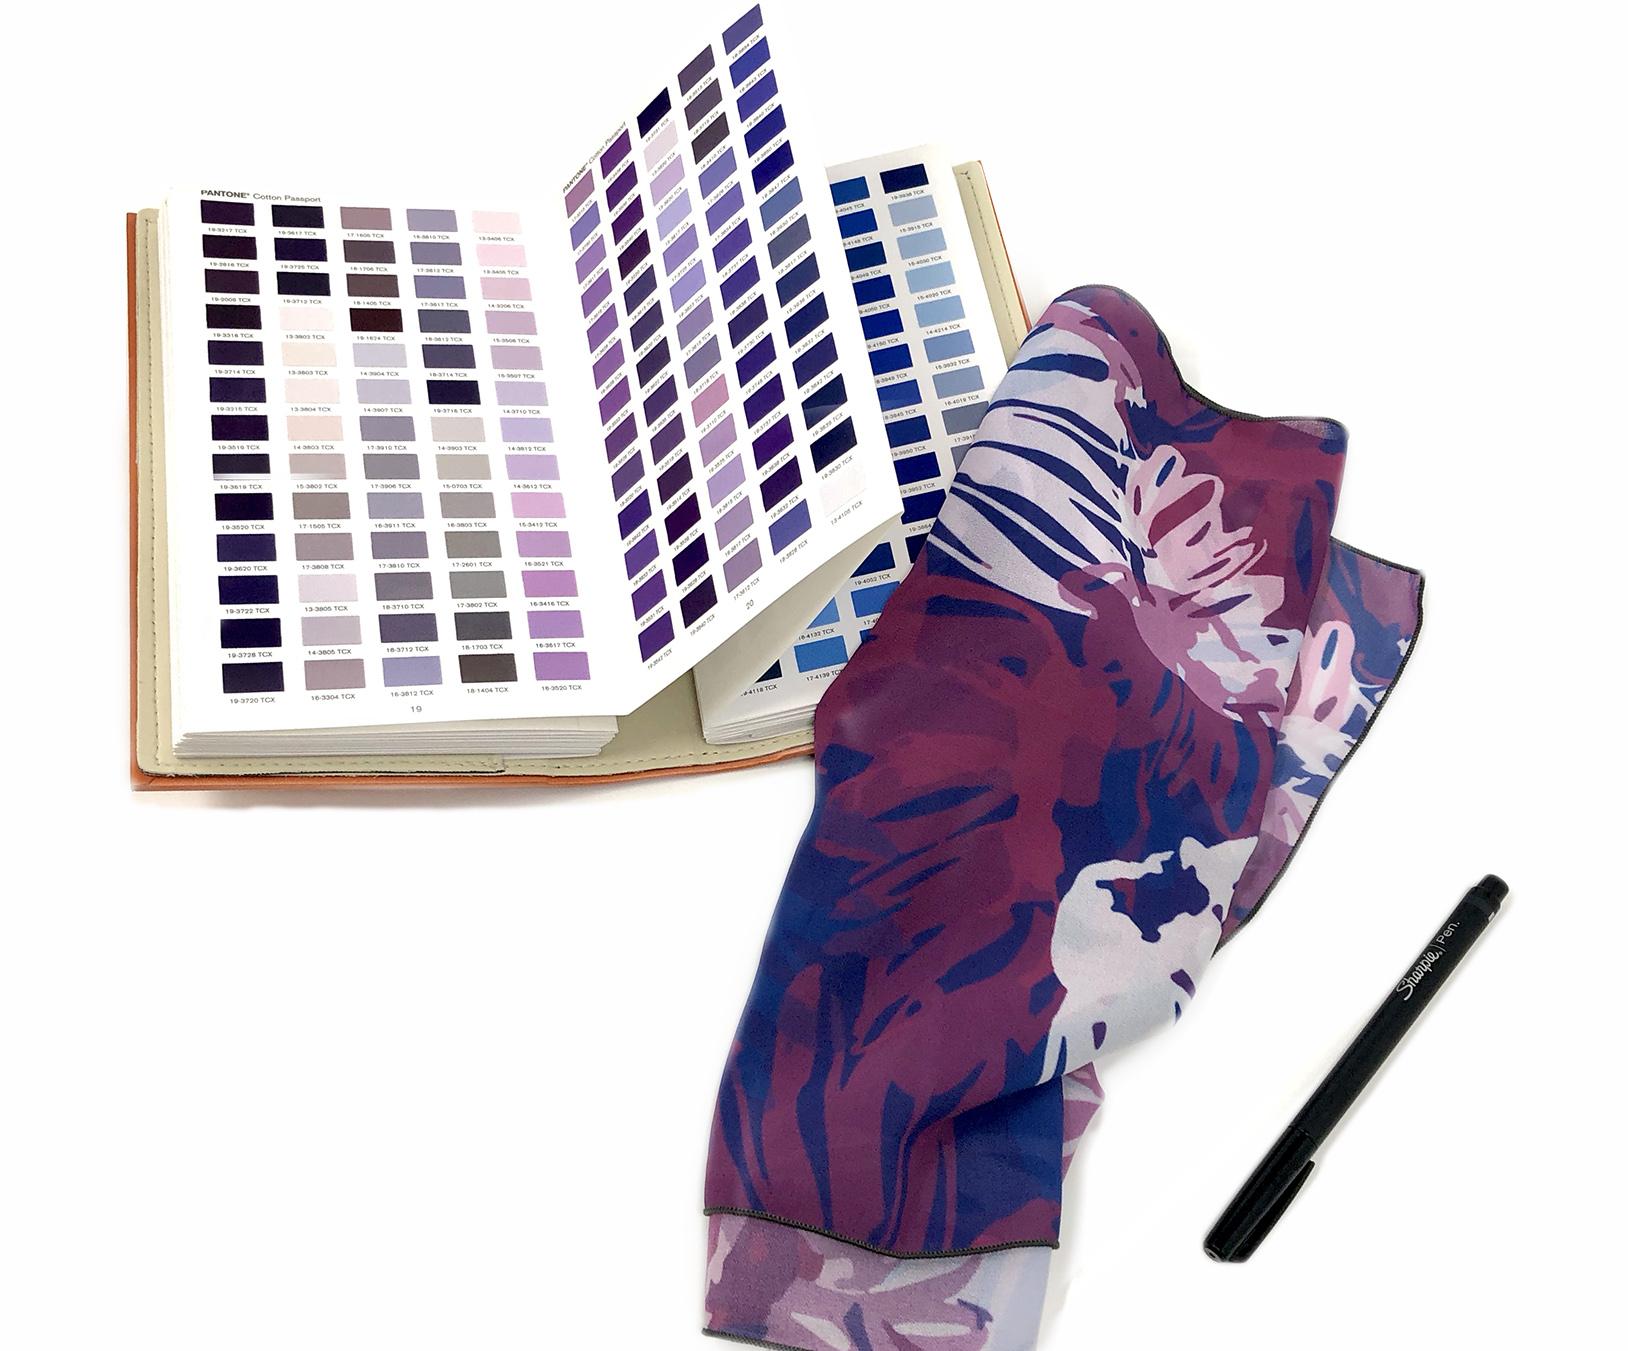 bova creative pantone textile swatches.jpg